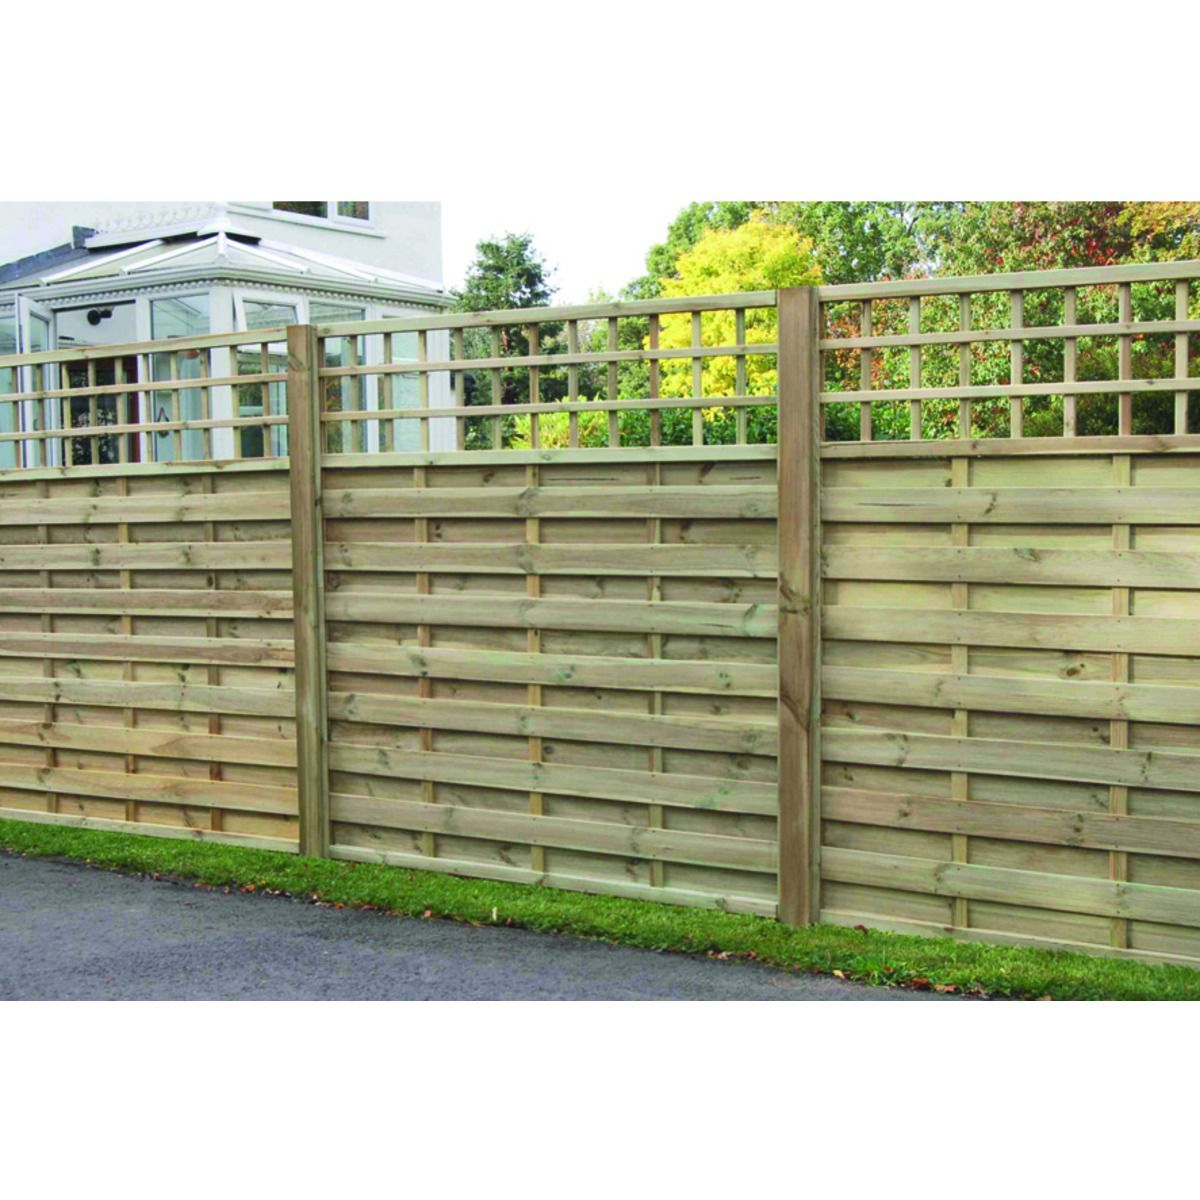 Wickes hertford fence panel 18m x 18m integrated trellis fence wickes hertford fence panel 18m x 18m integrated trellis baanklon Images